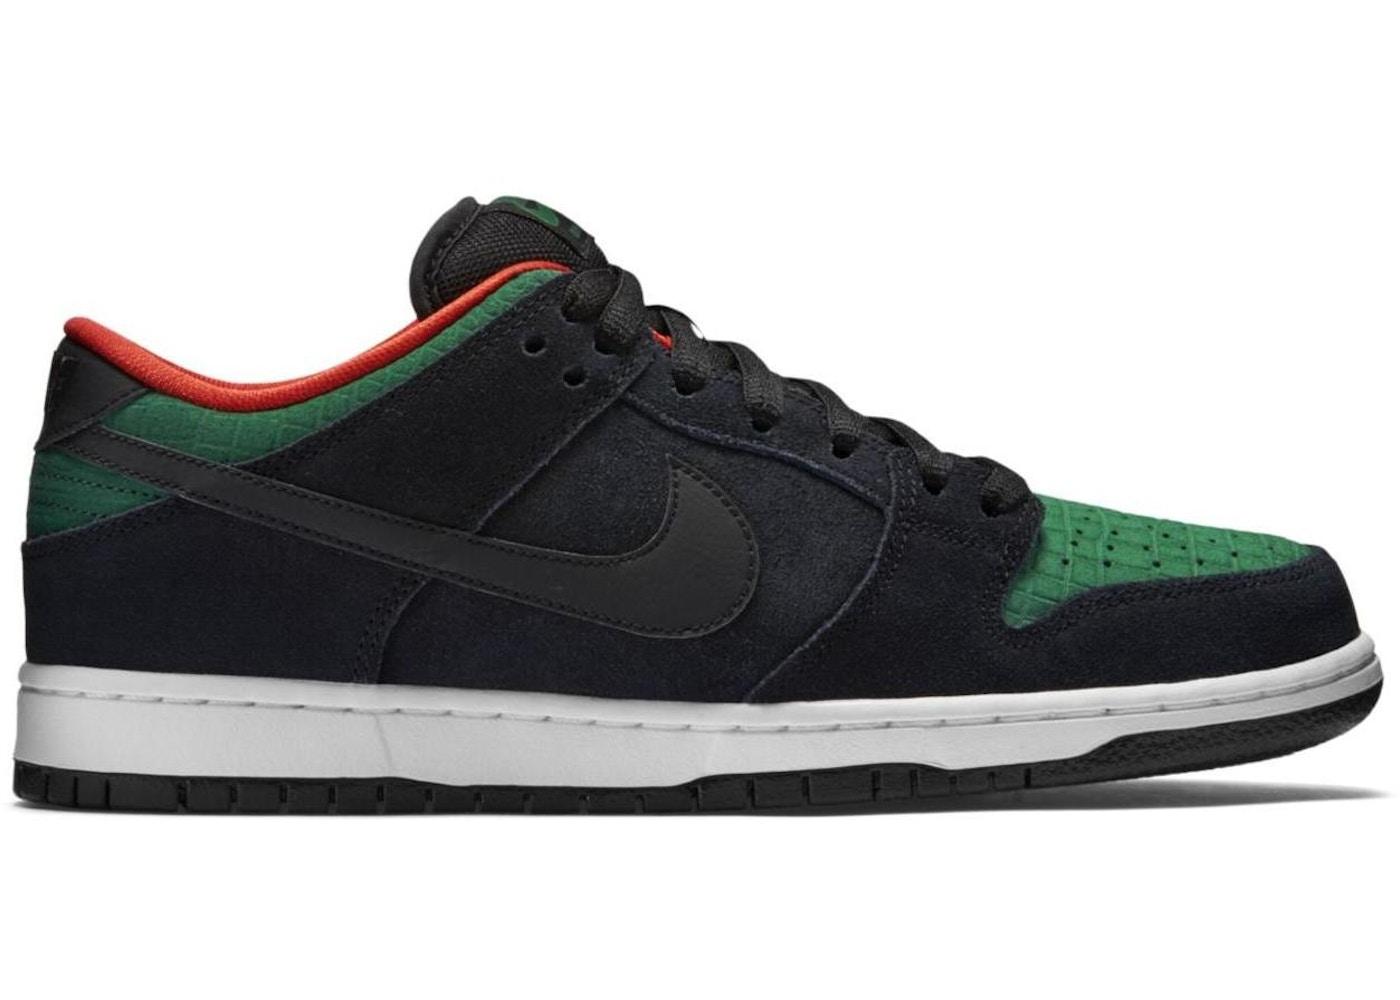 purchase cheap b0eb0 4eb15 Nike Dunk SB Low Reptile Gucci - 304292-055